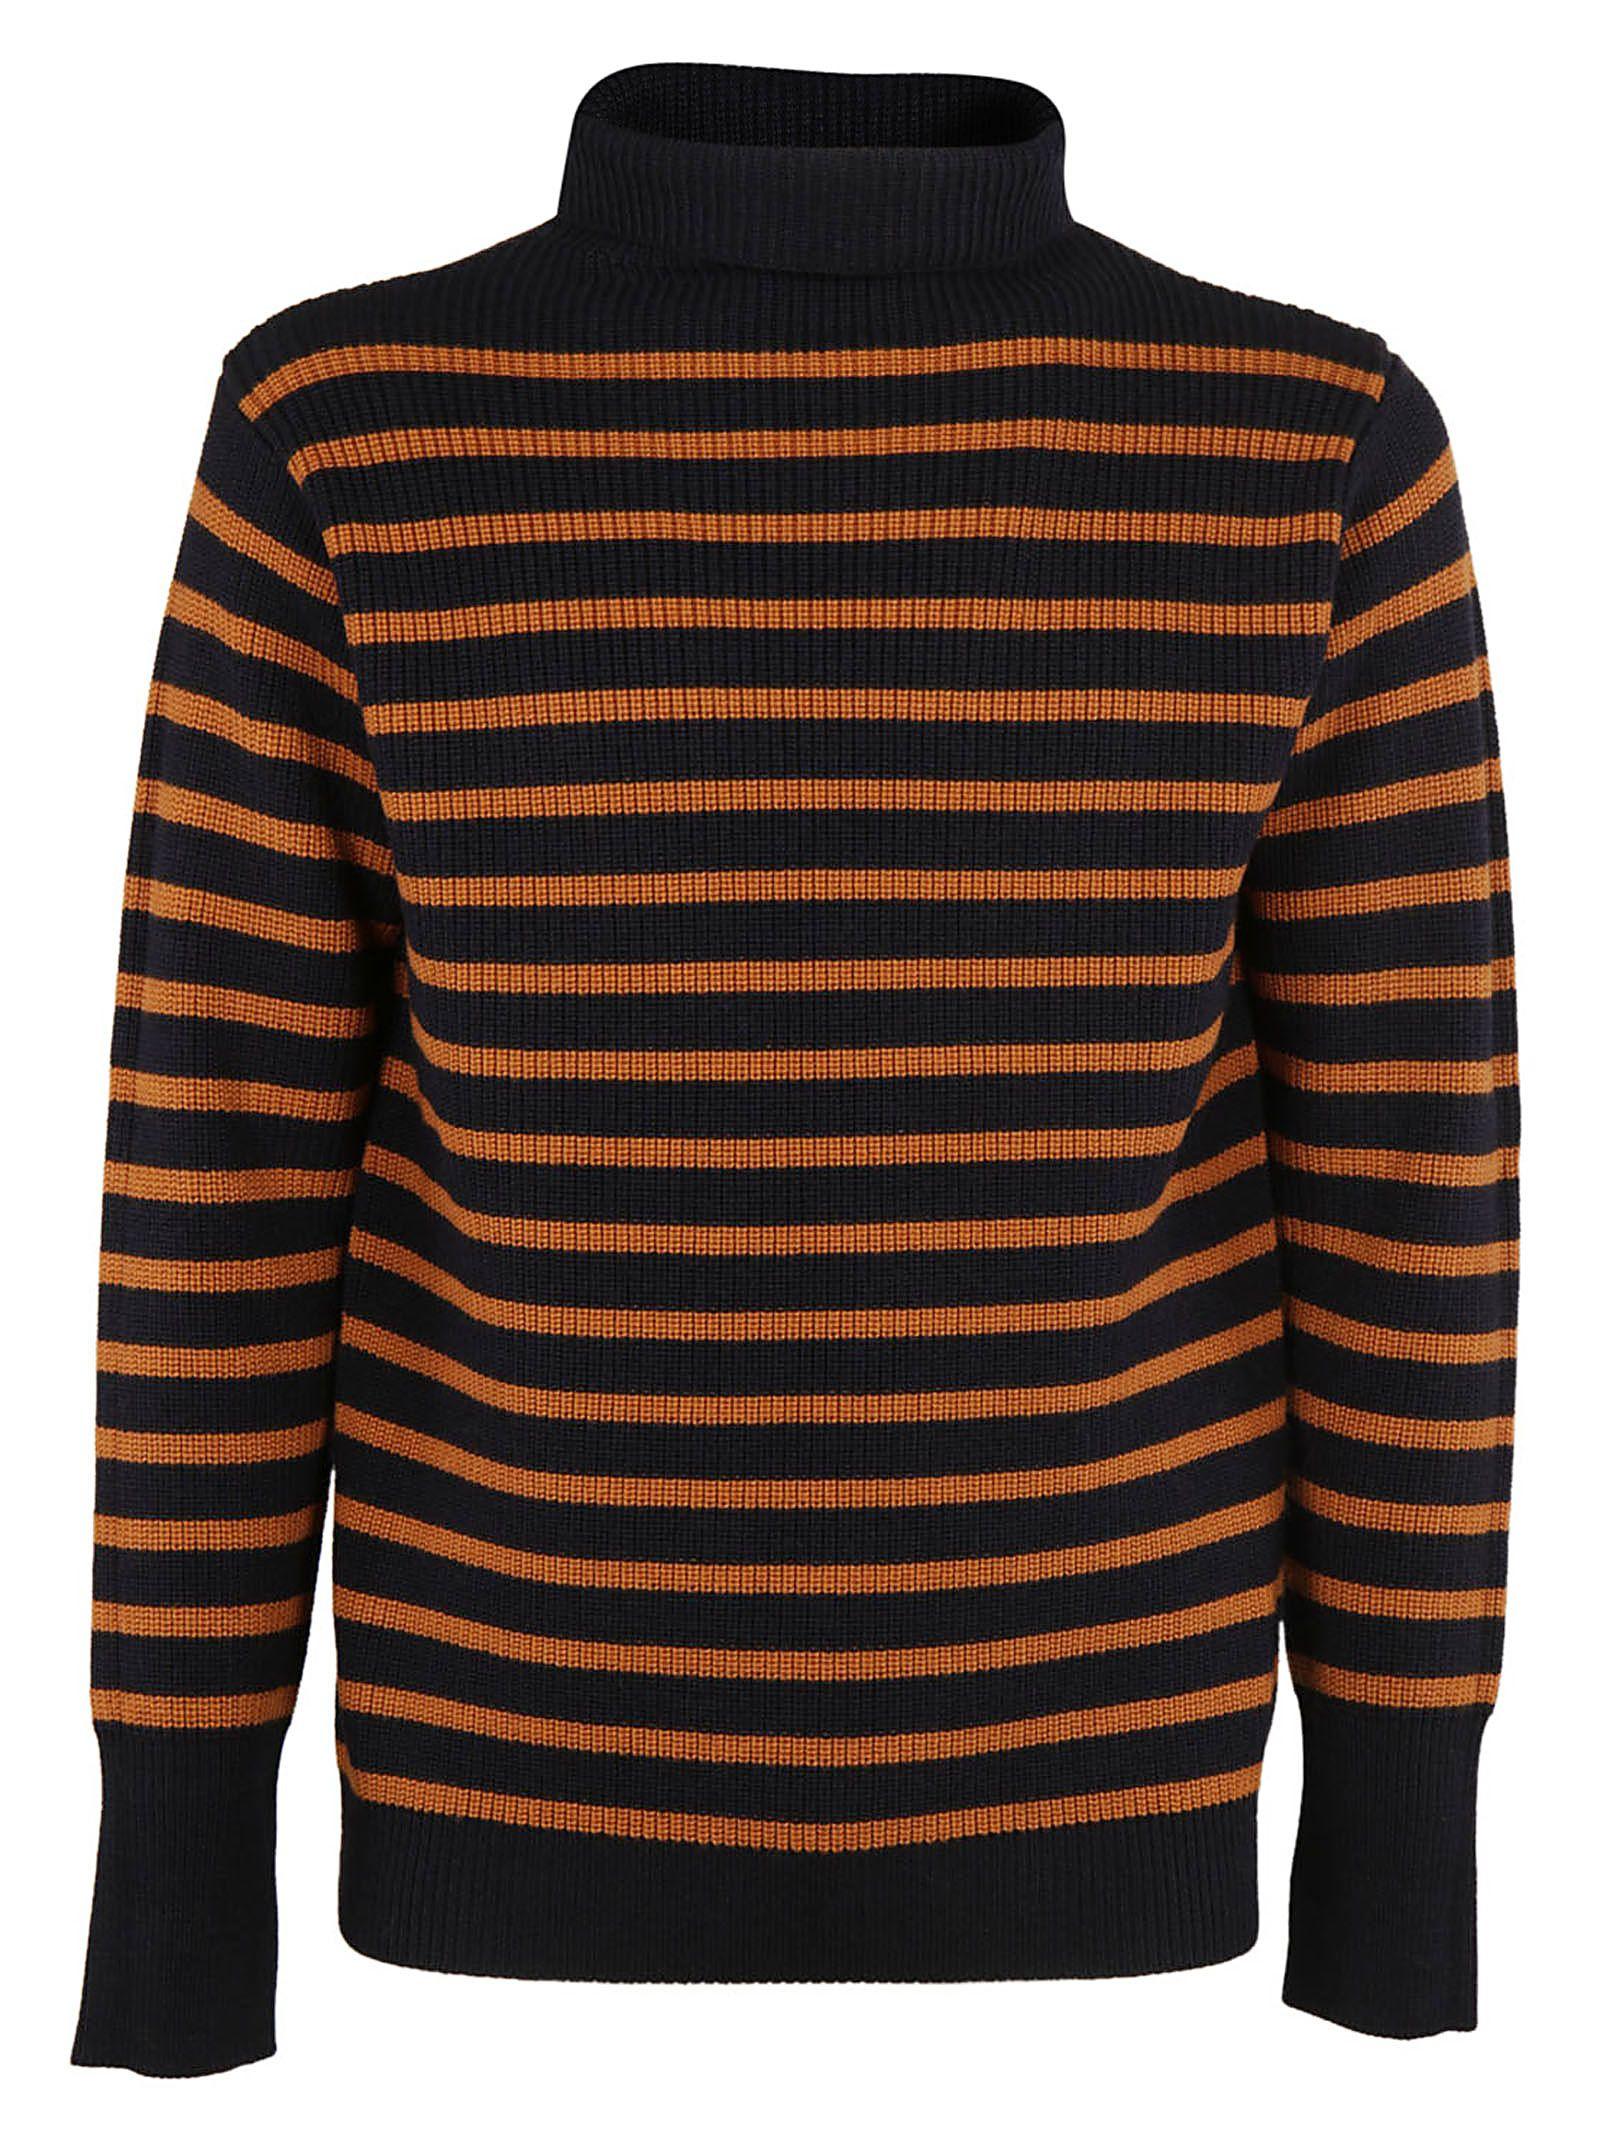 Barena - Barena Striped Sweater - Navy/Orange, Men's Sweaters ...